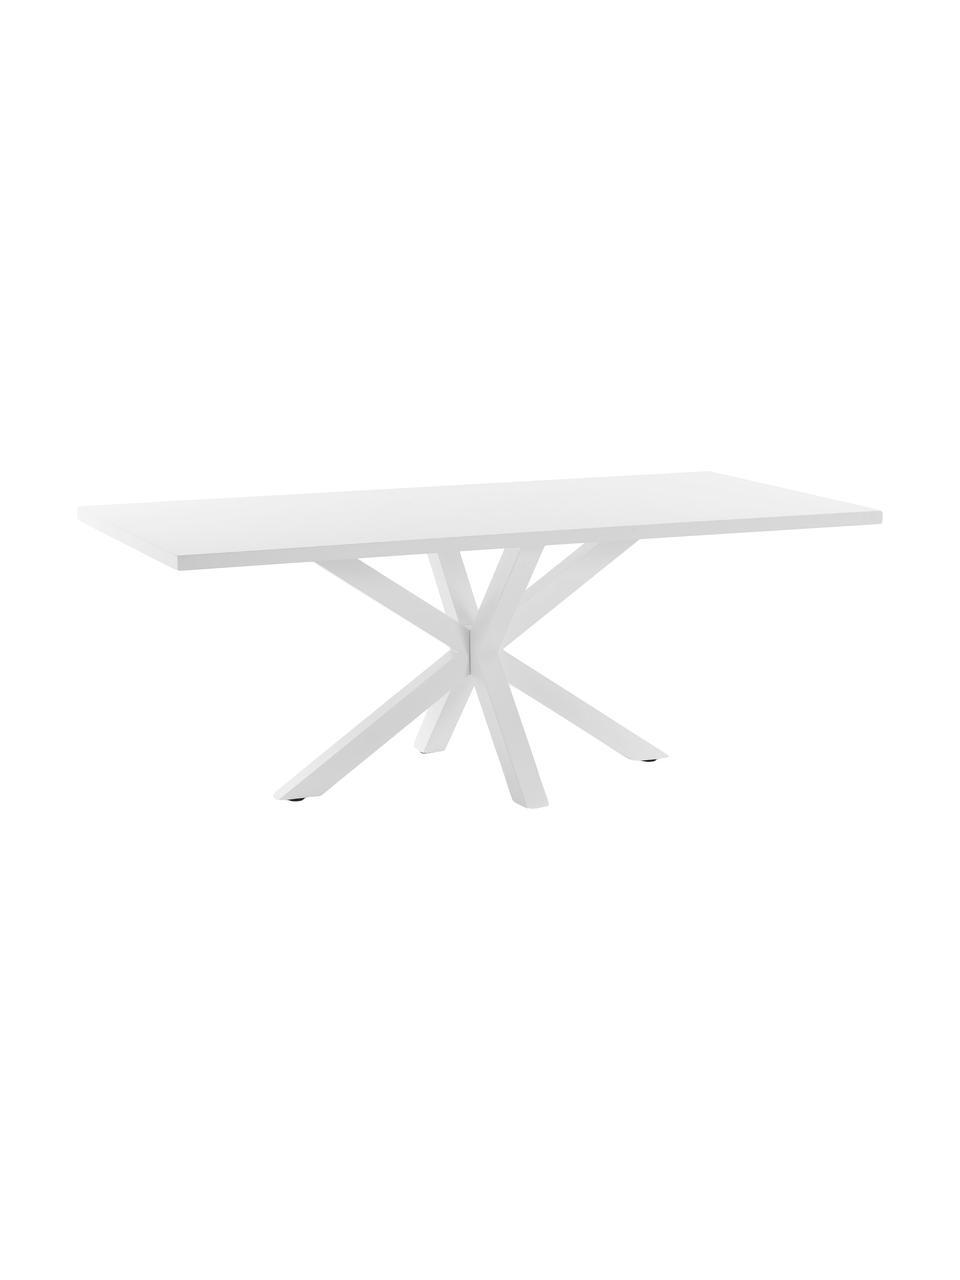 Table blanche en bois et métal New-Arya, 160 x 100 cm, Blanc